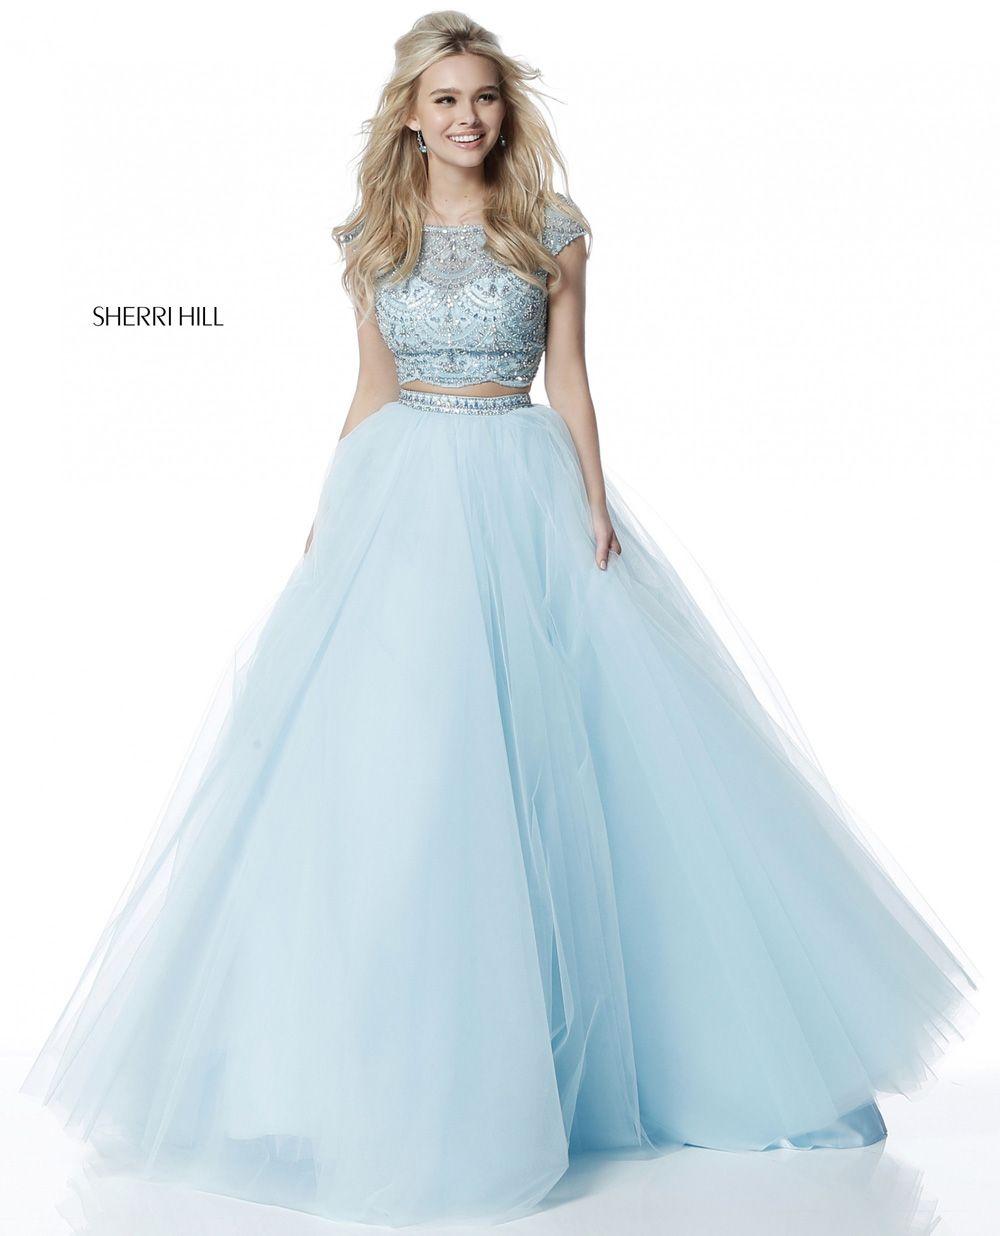 Contemporary Jora Prom Dresses Vignette - All Wedding Dresses ...